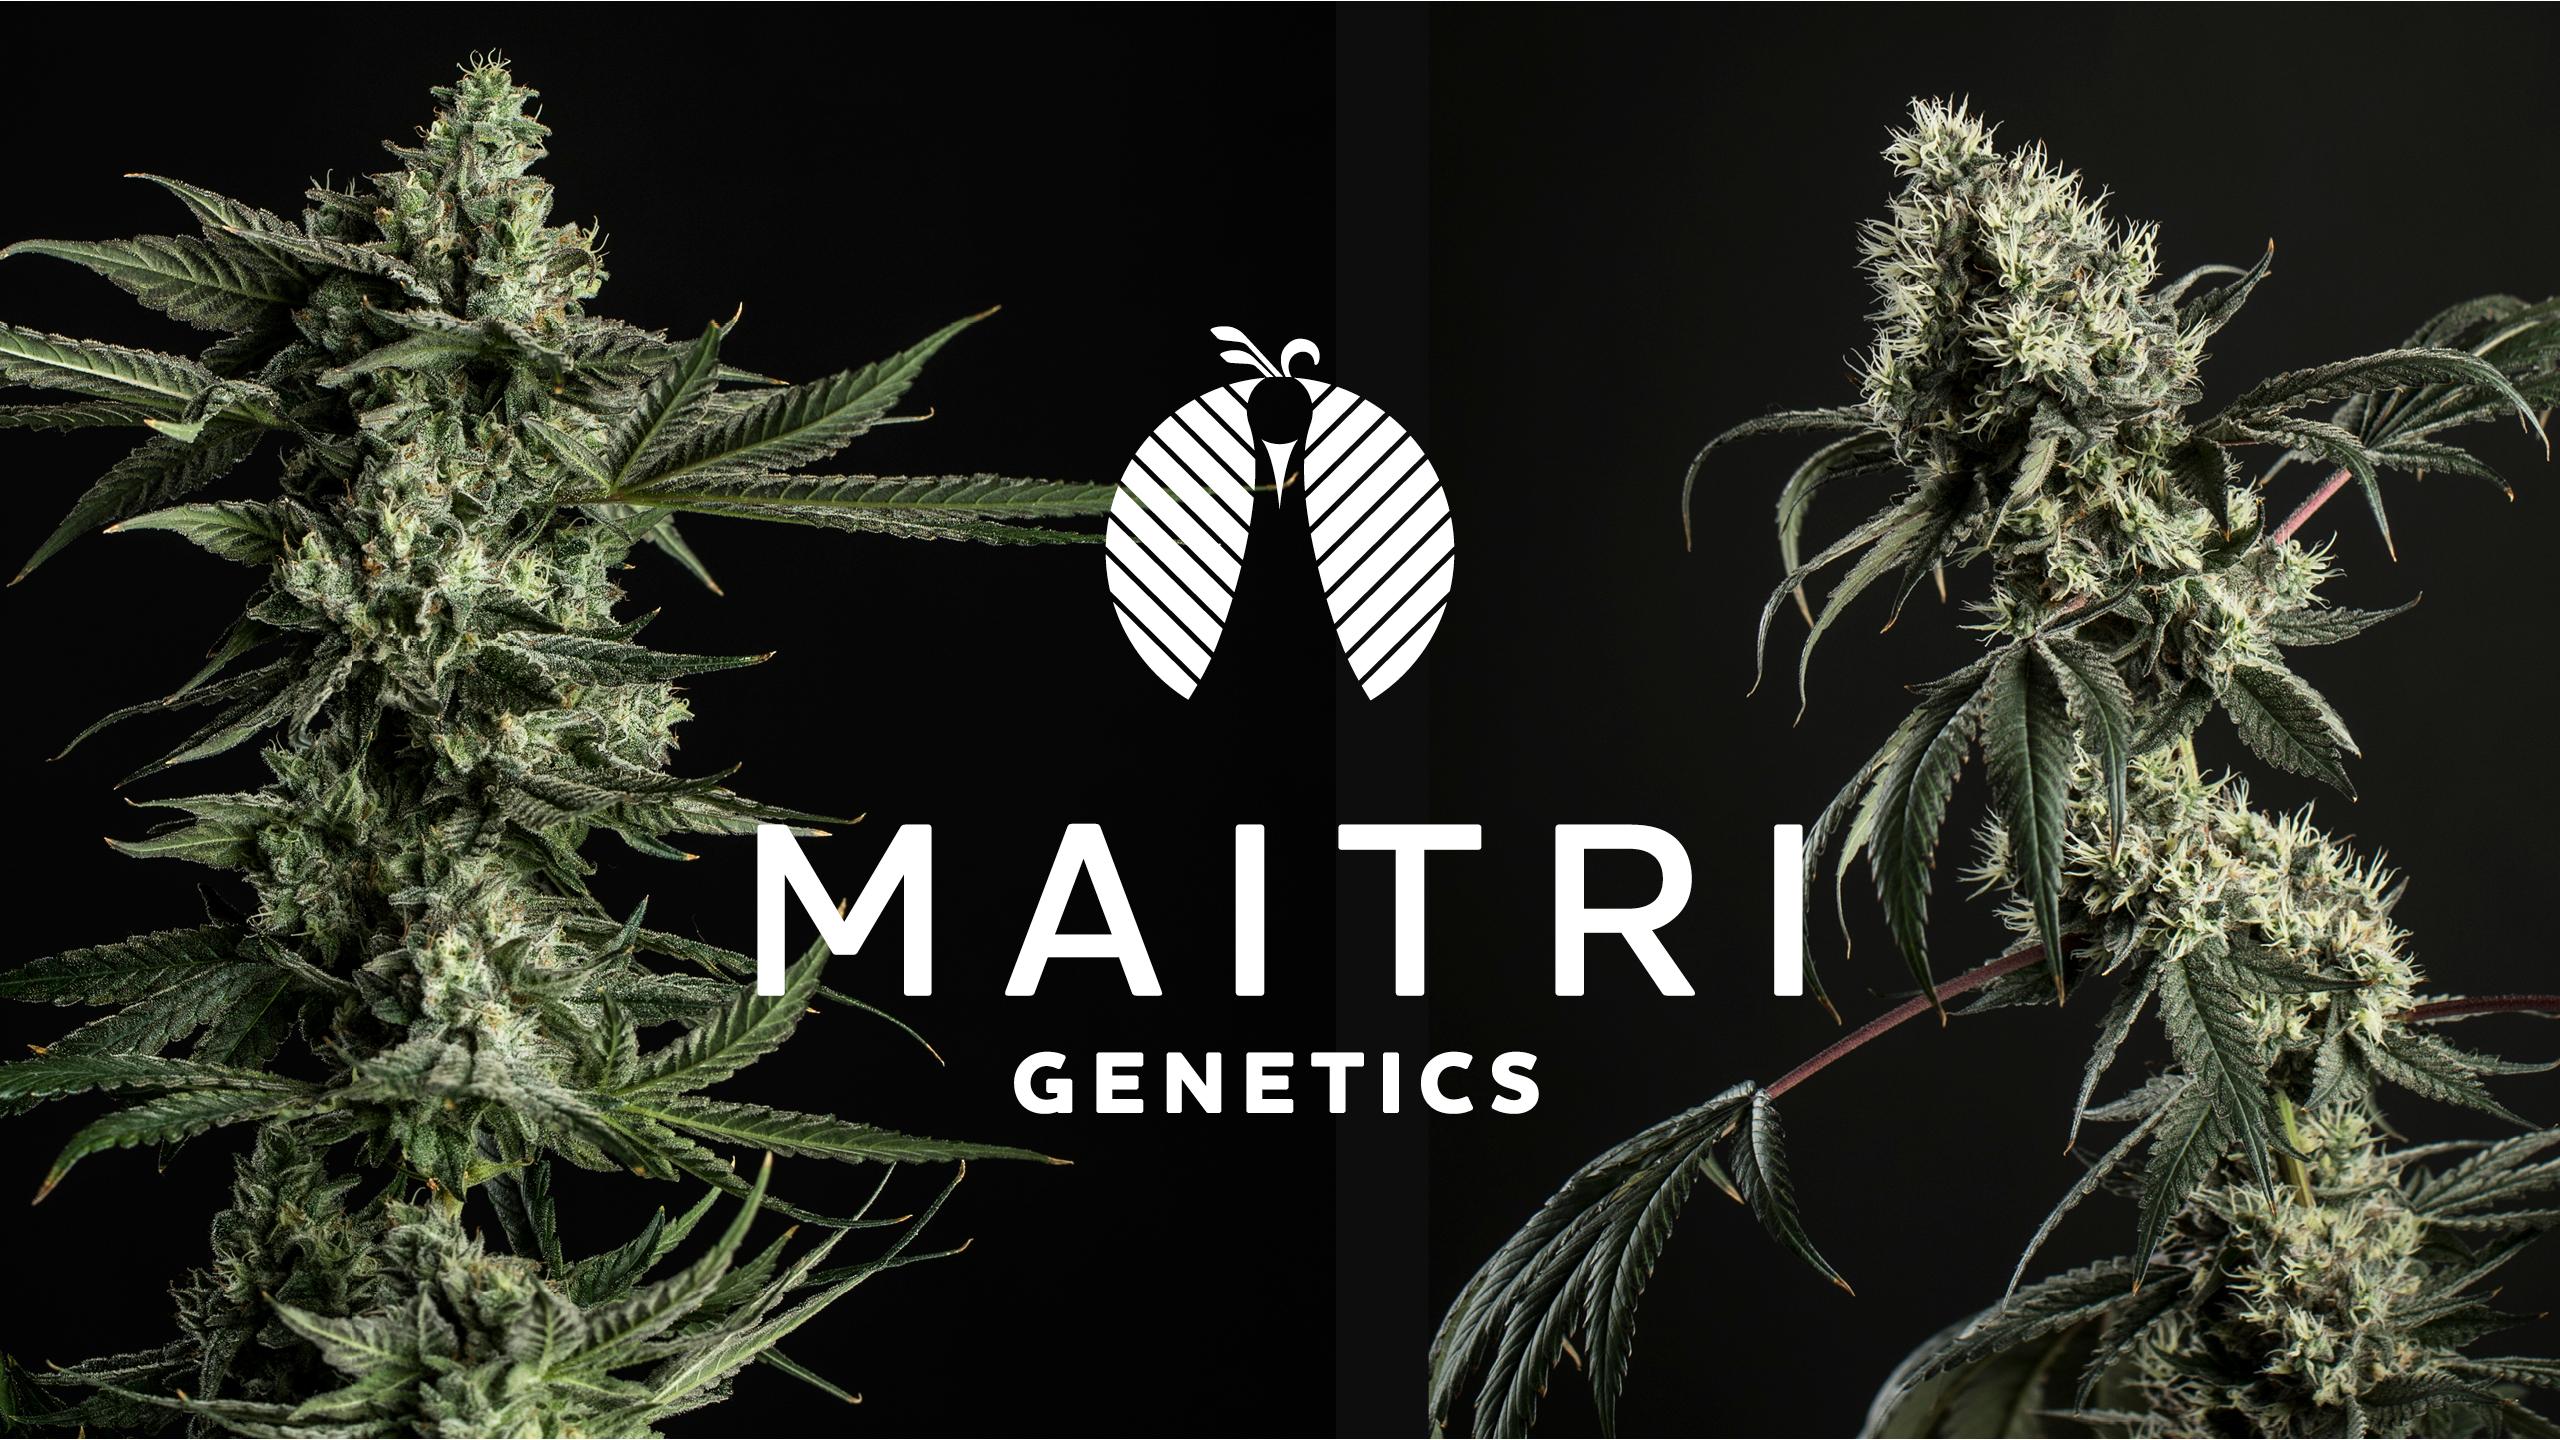 Maitri Genetics Brand Identity & Logo Creation by High Road Design Studio